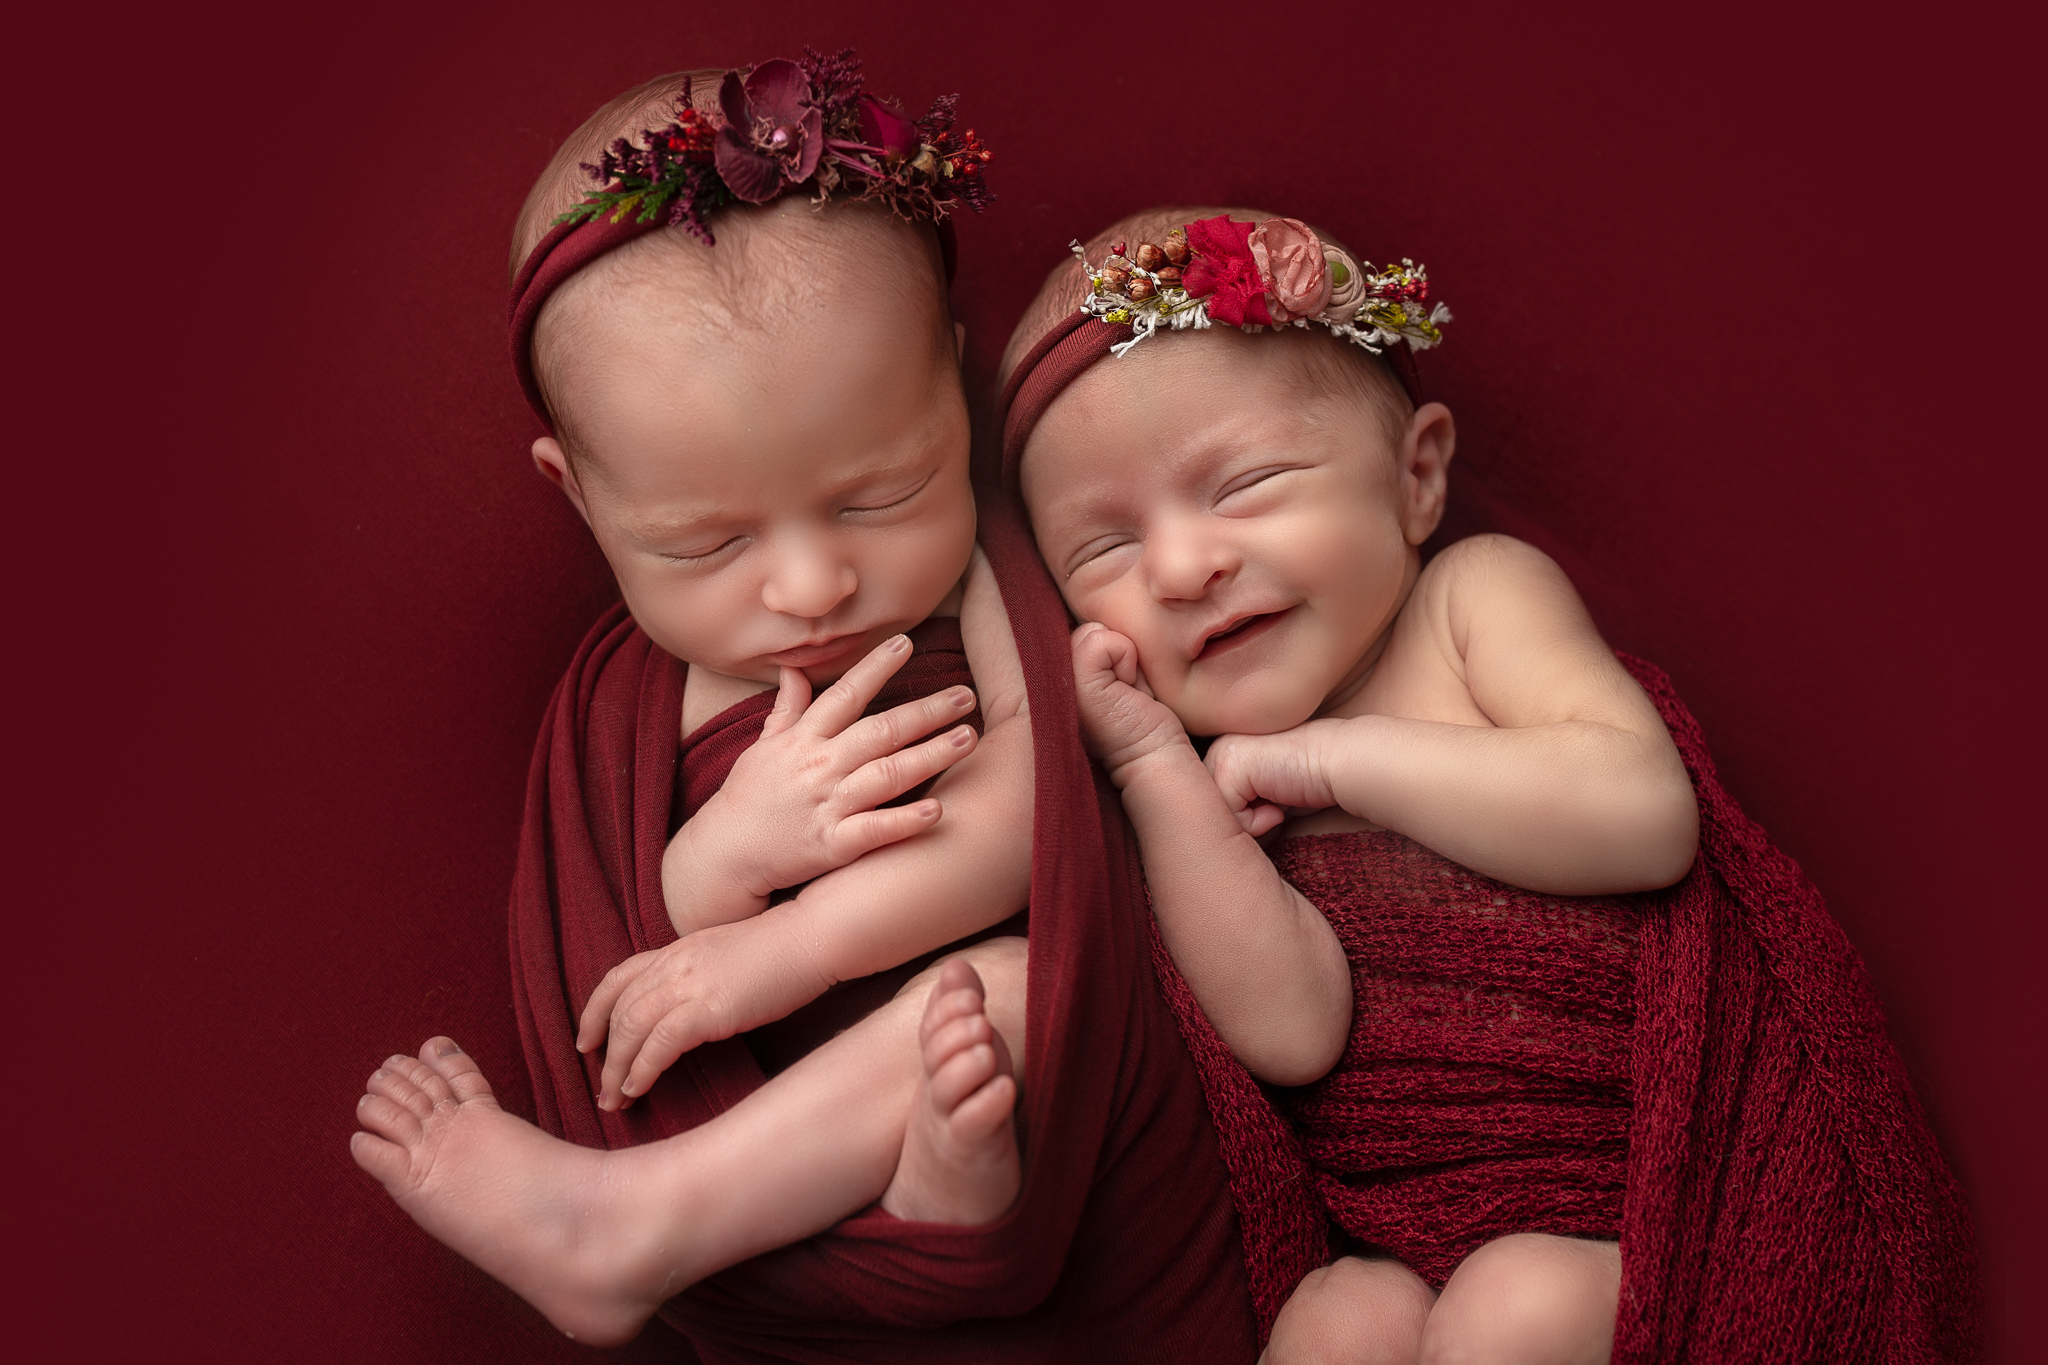 Newborn twin photographer Leeds, newborn photographer Leeds-York-Harrogate-Bradford, Yorkshire: winter theme twin session in Leeds, Yorkshire. Twin baby girls sleeping on a red blanket